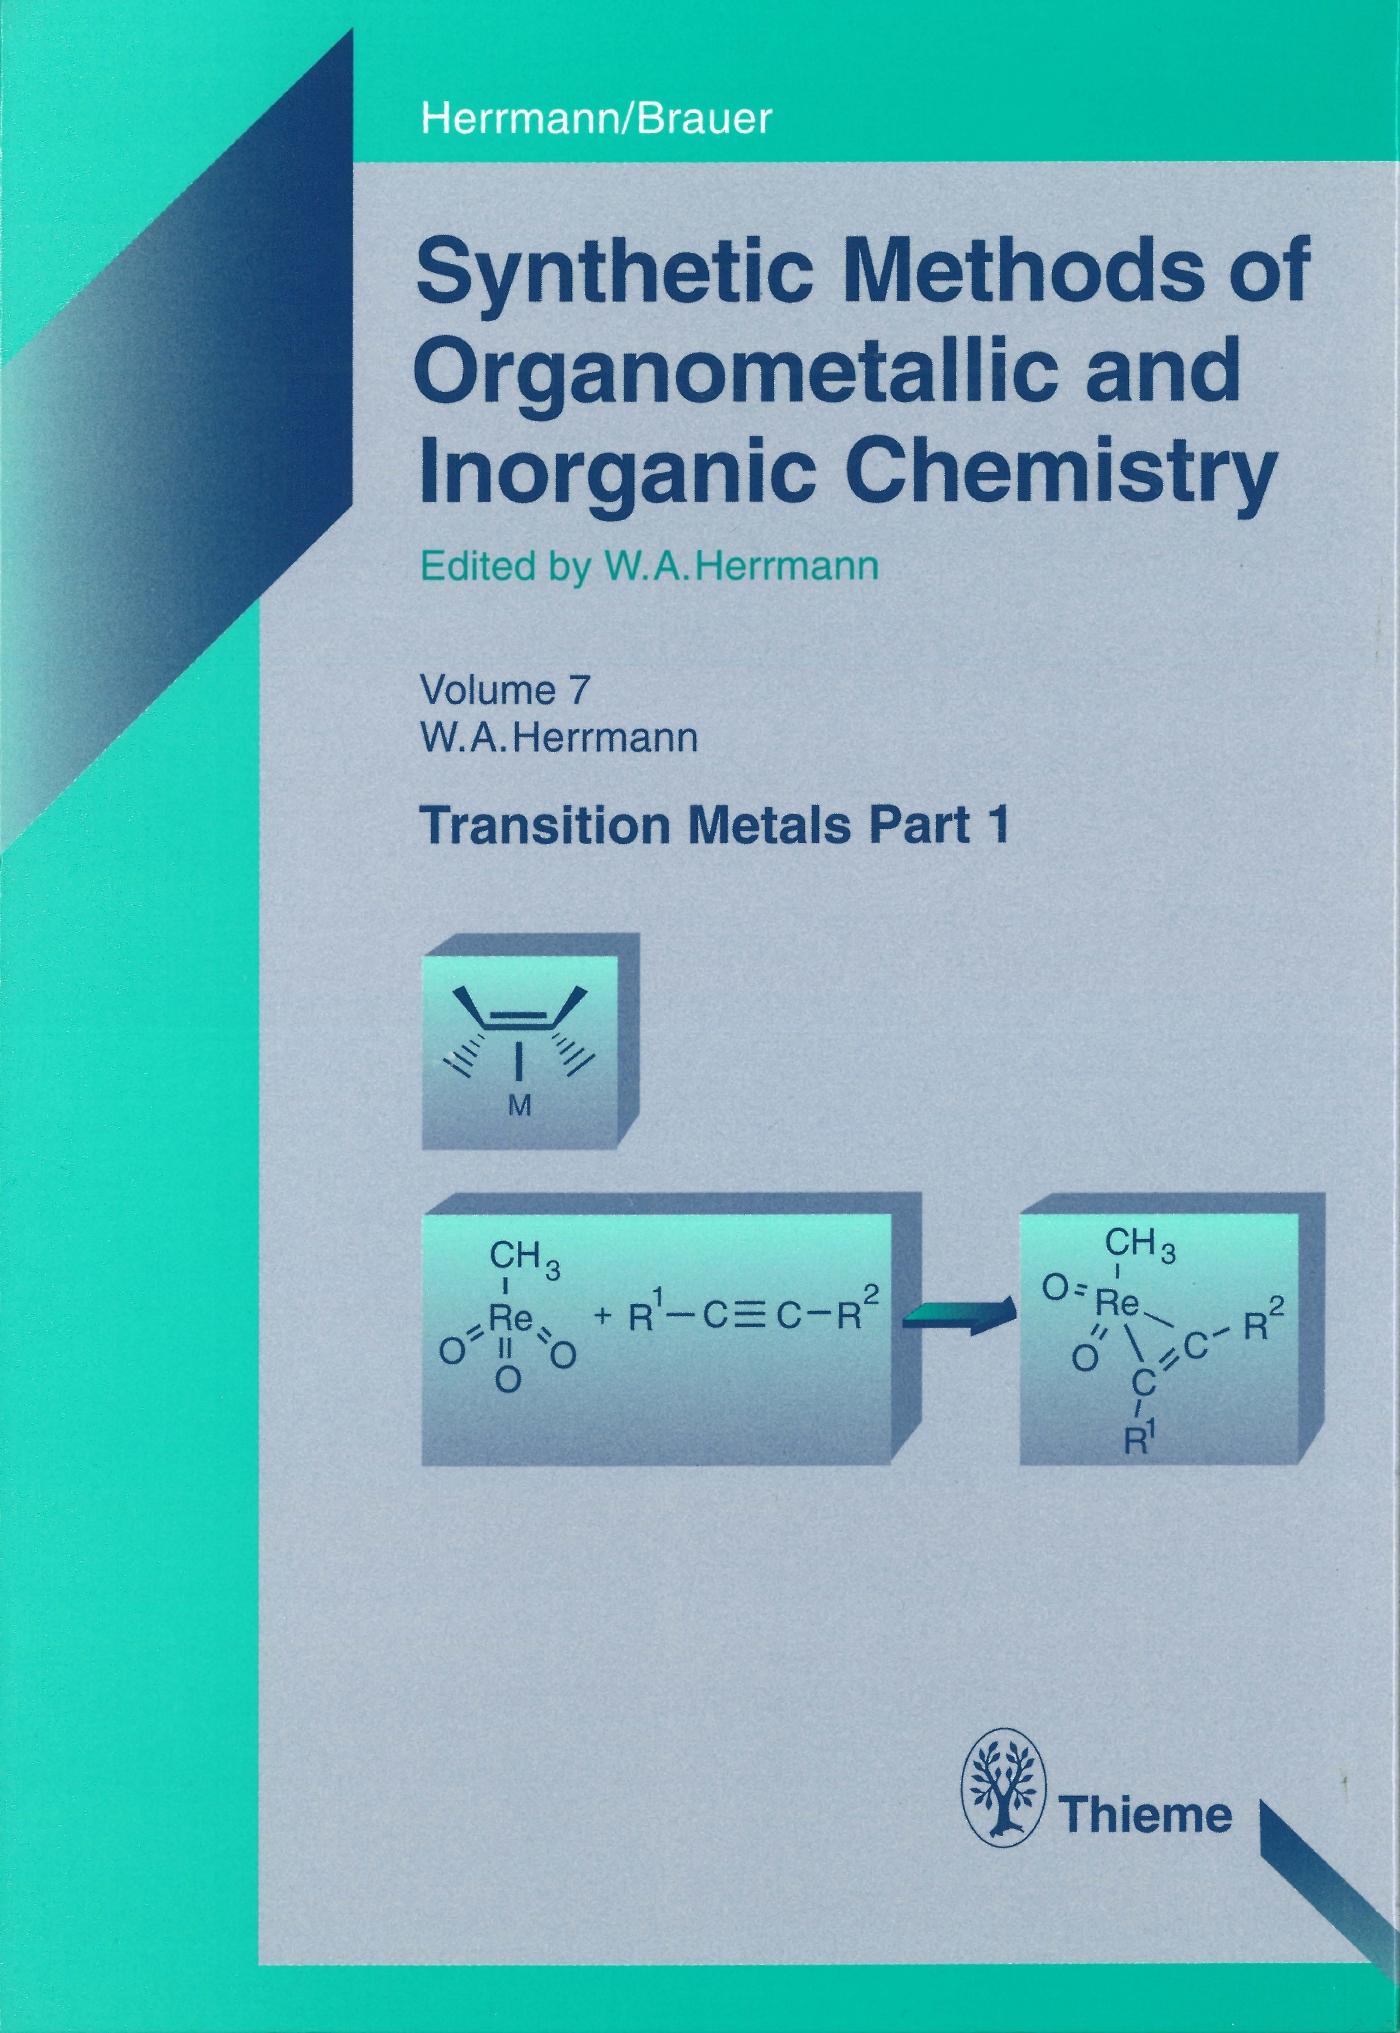 Synthetic Methods of Organometallic and Inorganic Chemistry, Volume 7, 1997